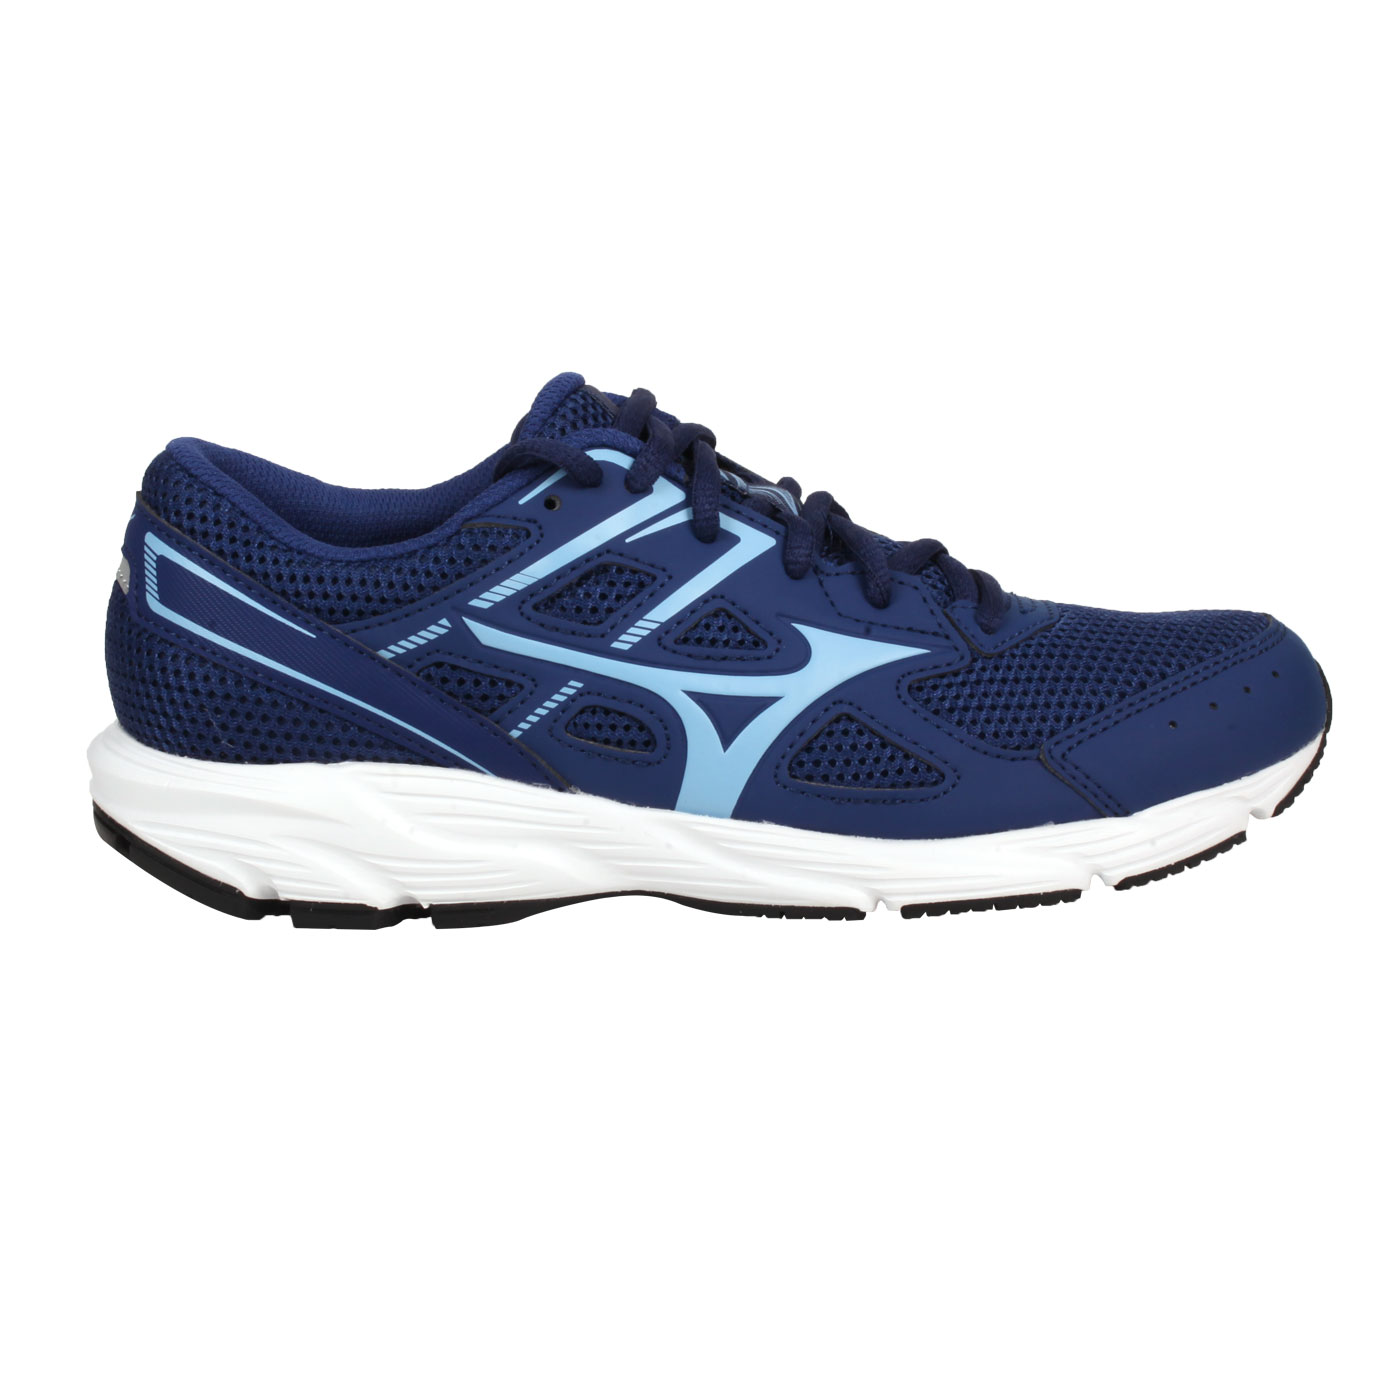 MIZUNO 女款慢跑鞋-WIDE  @MAXIMIZER 23@K1GA210113 - 藍水藍